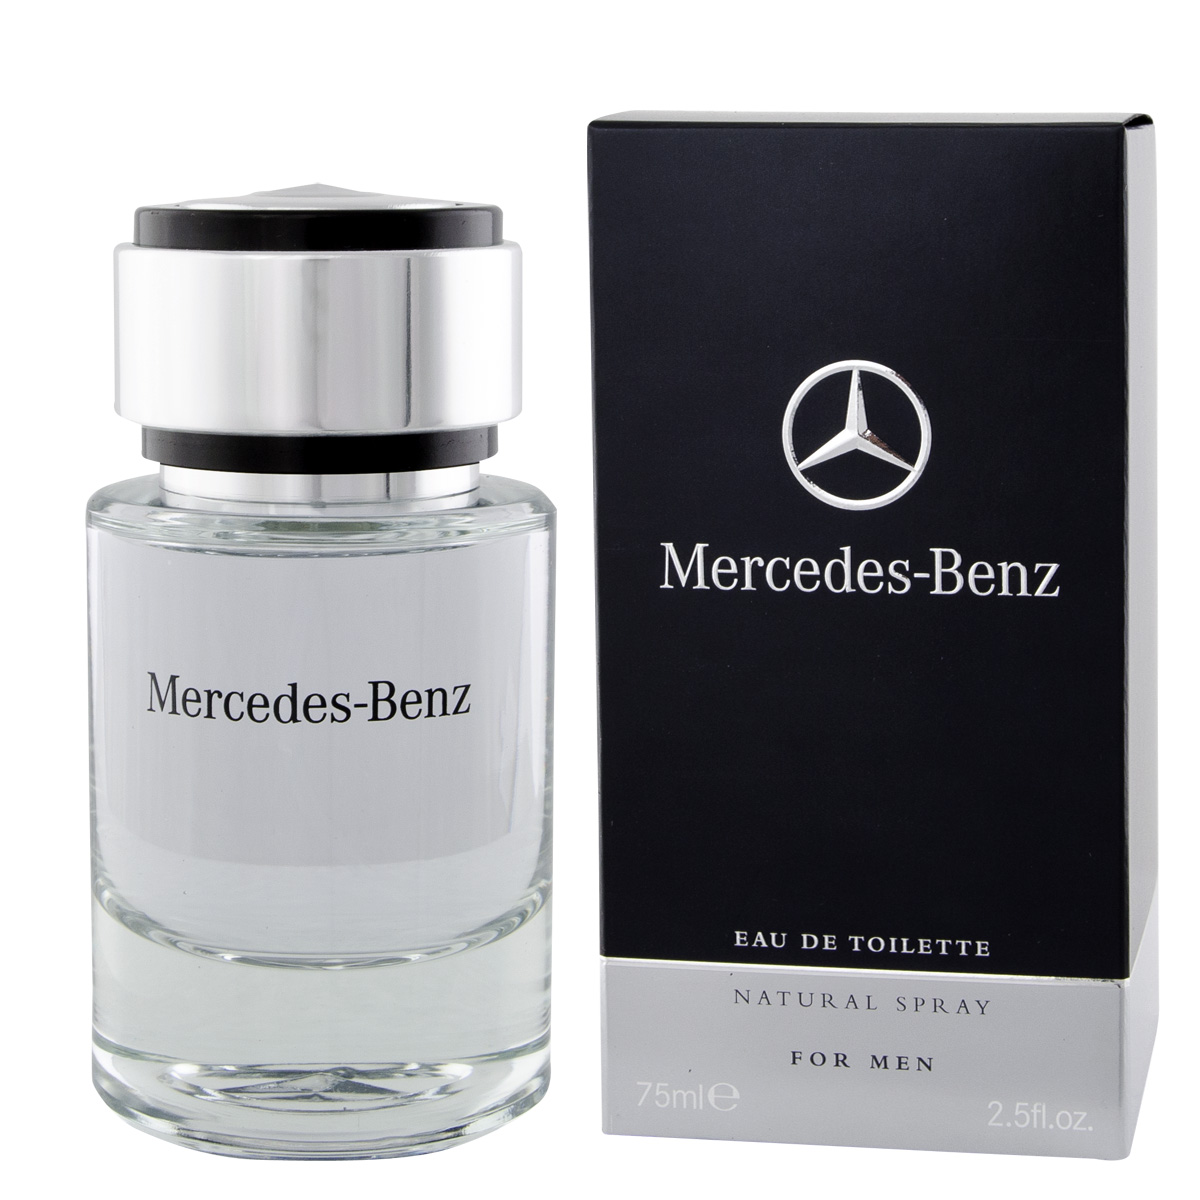 Mercedes-Benz Mercedes-Benz Eau De Toilette 75 ml (man) 71585